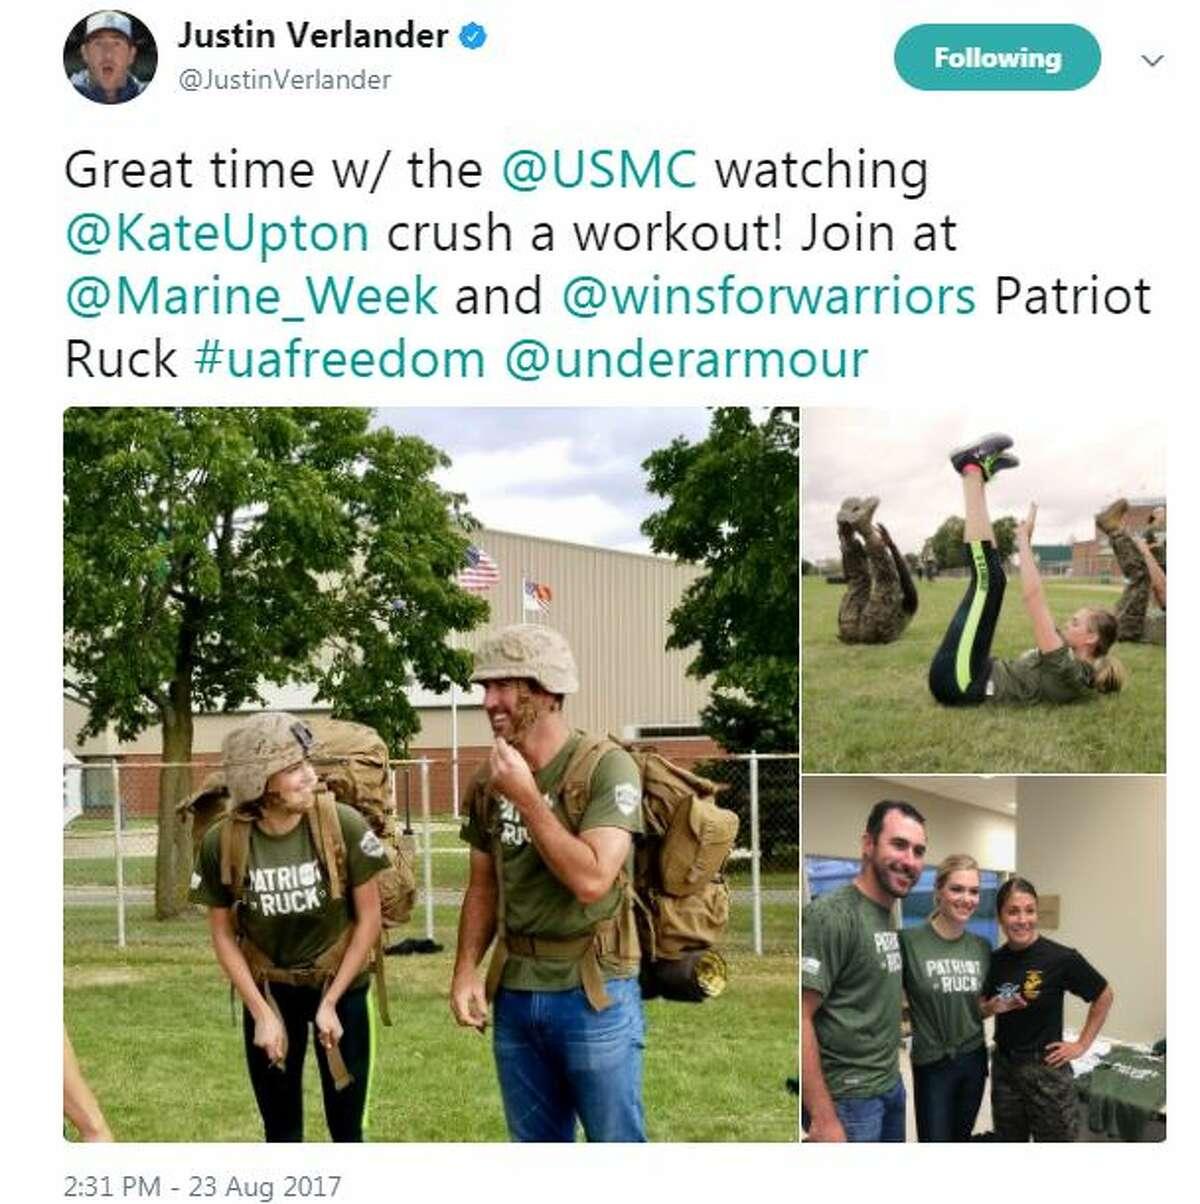 Justin Verlander Twitter post.